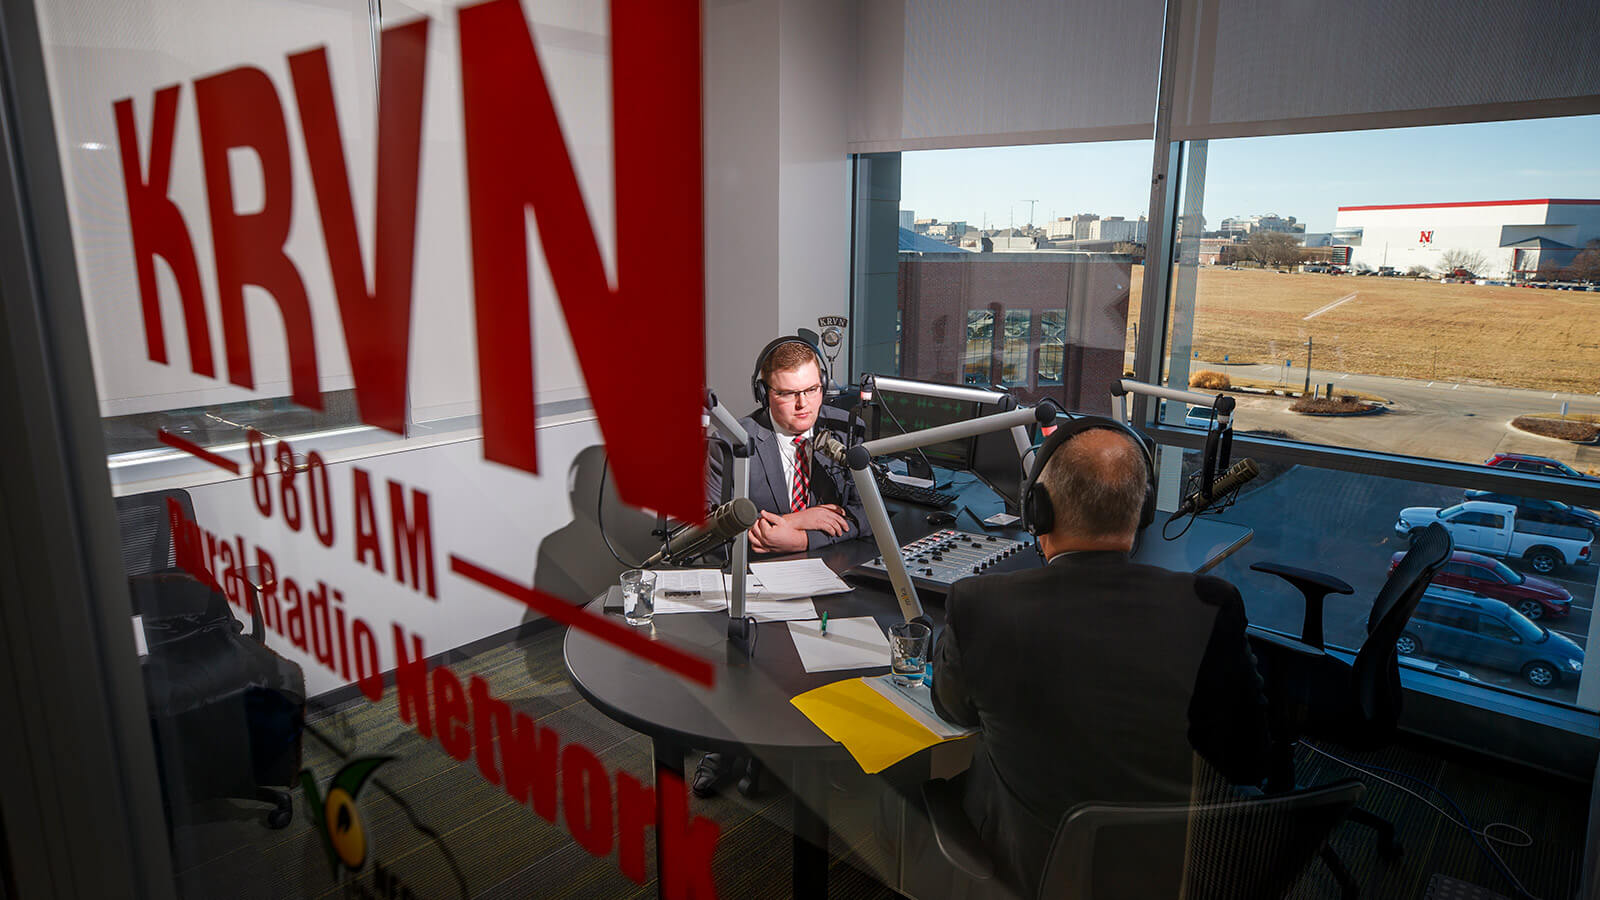 Guest being interviewed in KRVN studio